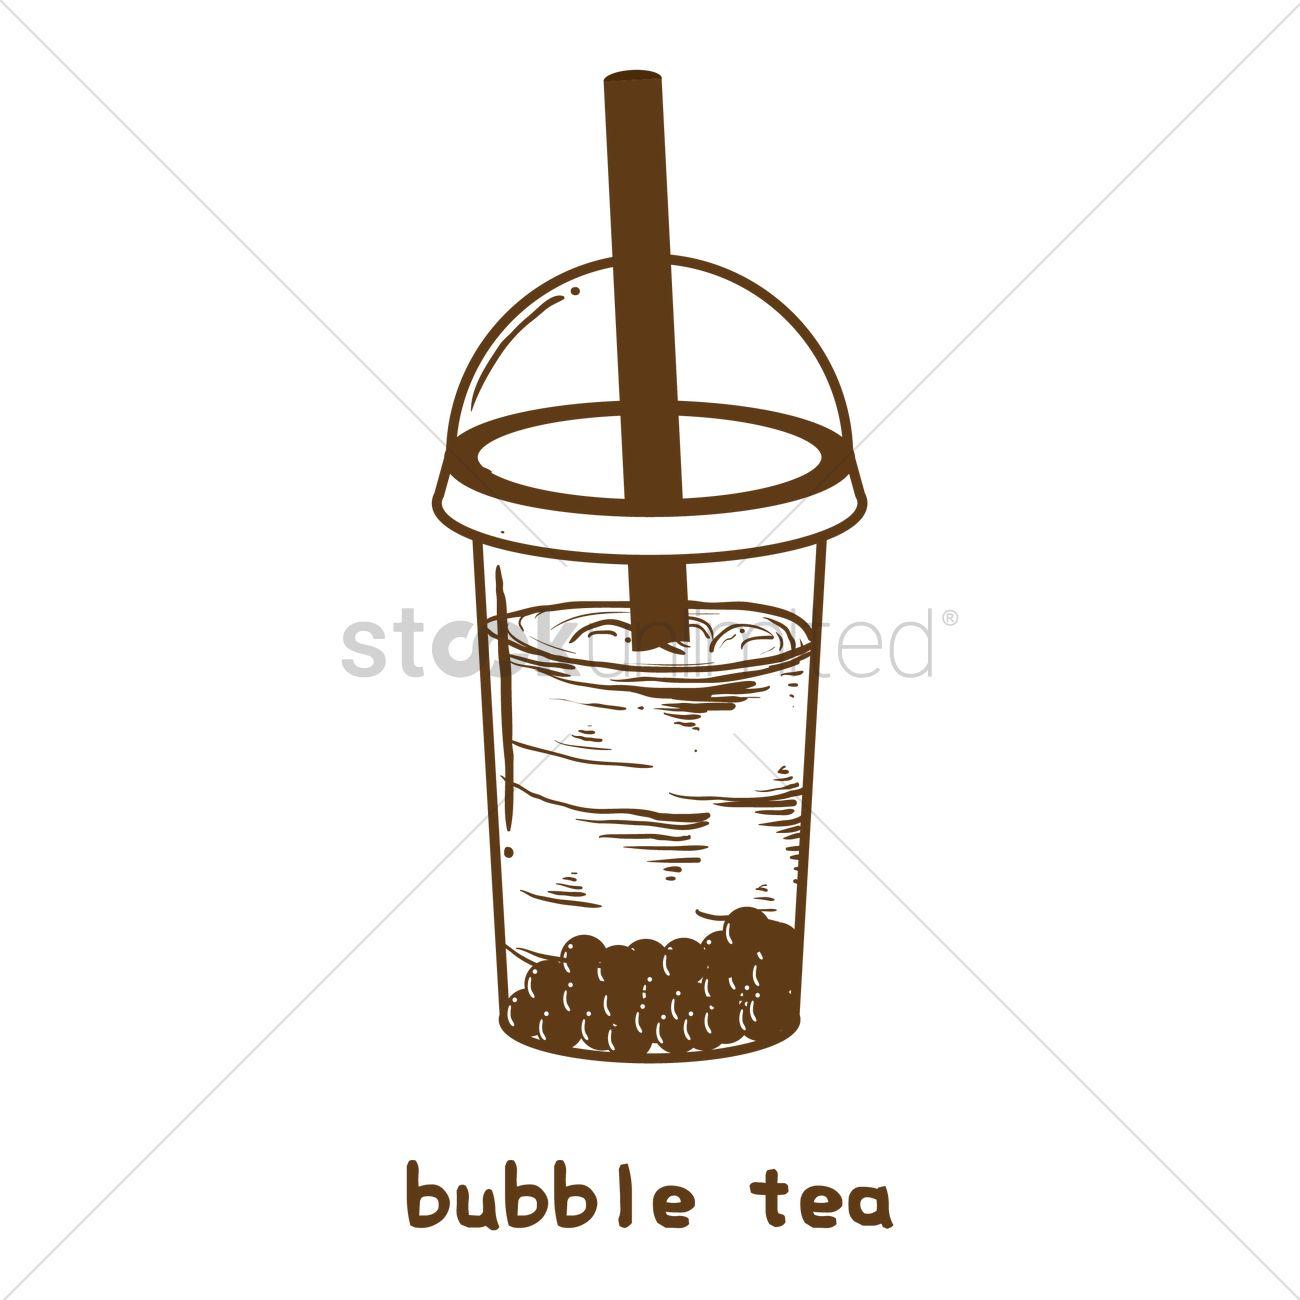 1300x1300 Bubble Tea Vector Image